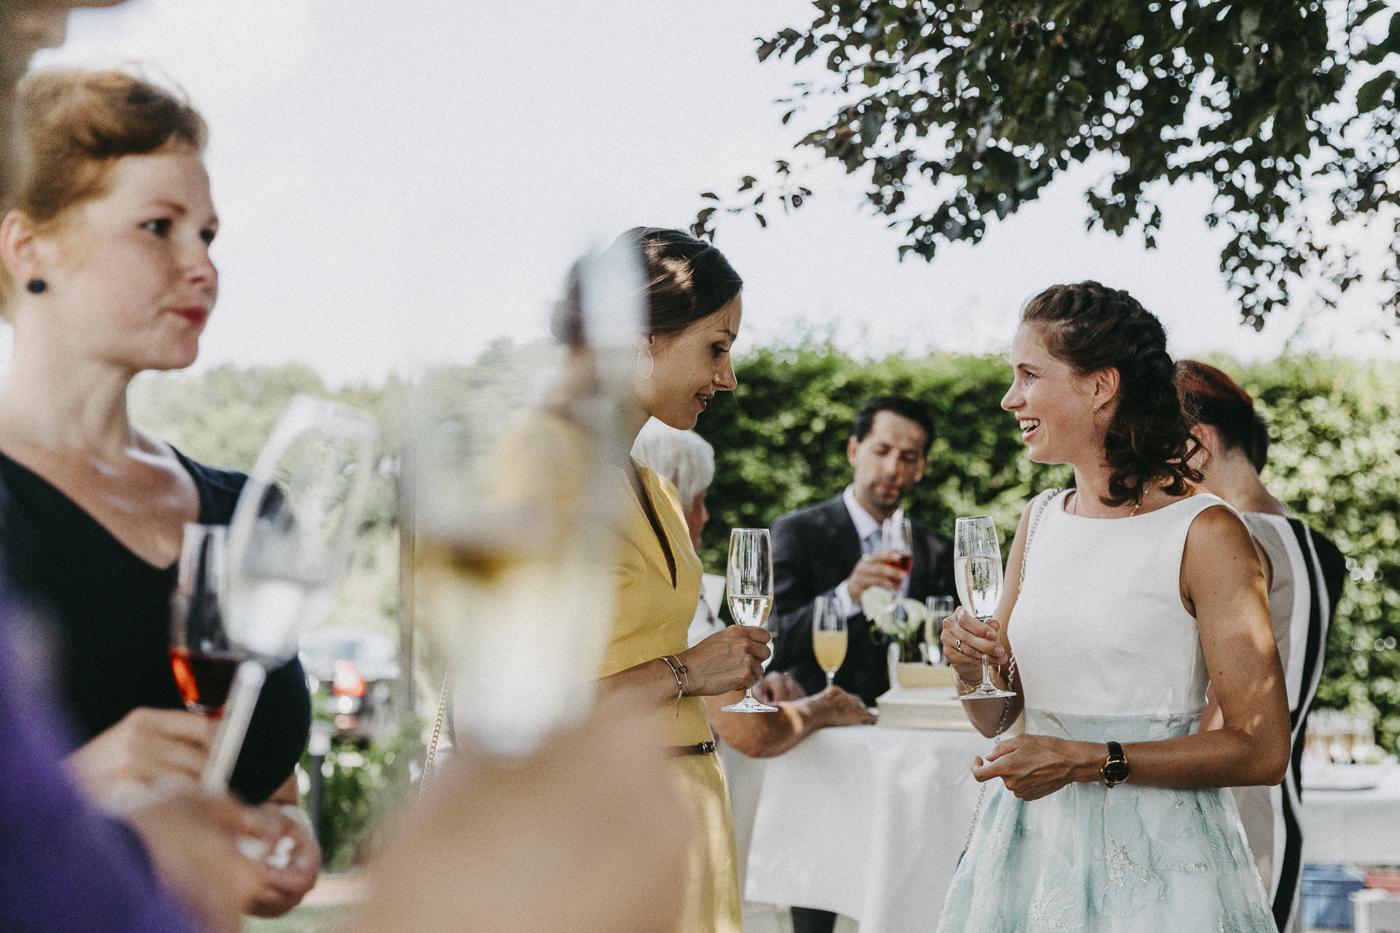 rosemarrylemon_ND_Hochzeit_Hochzeitsplanung4.jpg